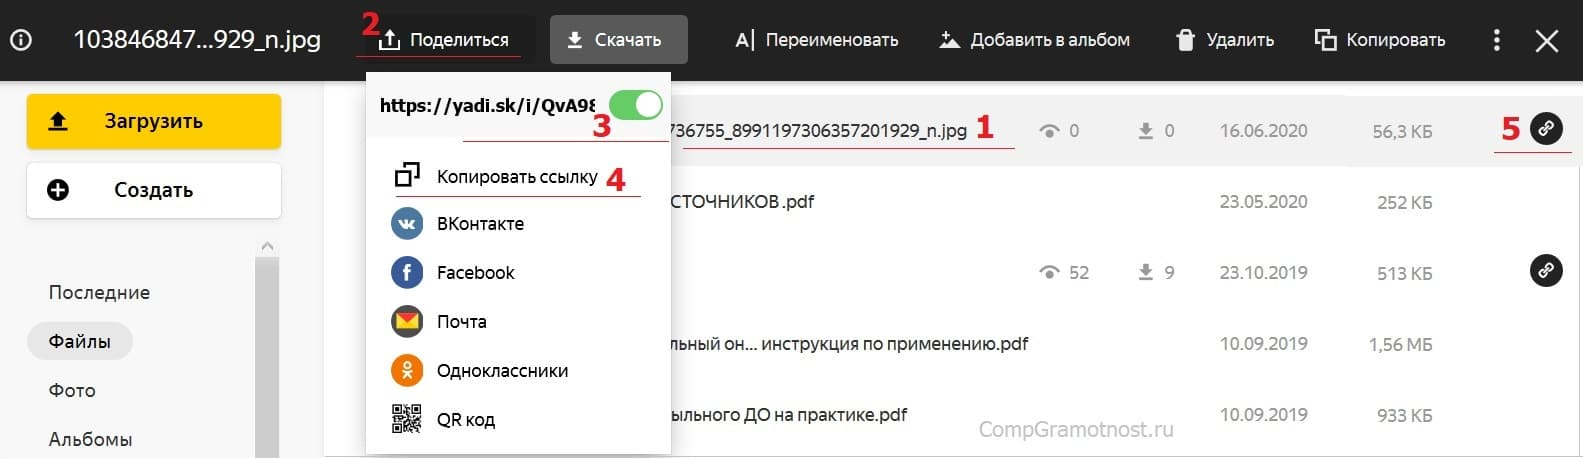 dat-ssylku-na-skachivanie-fajla-c-yandeks-diska.jpg